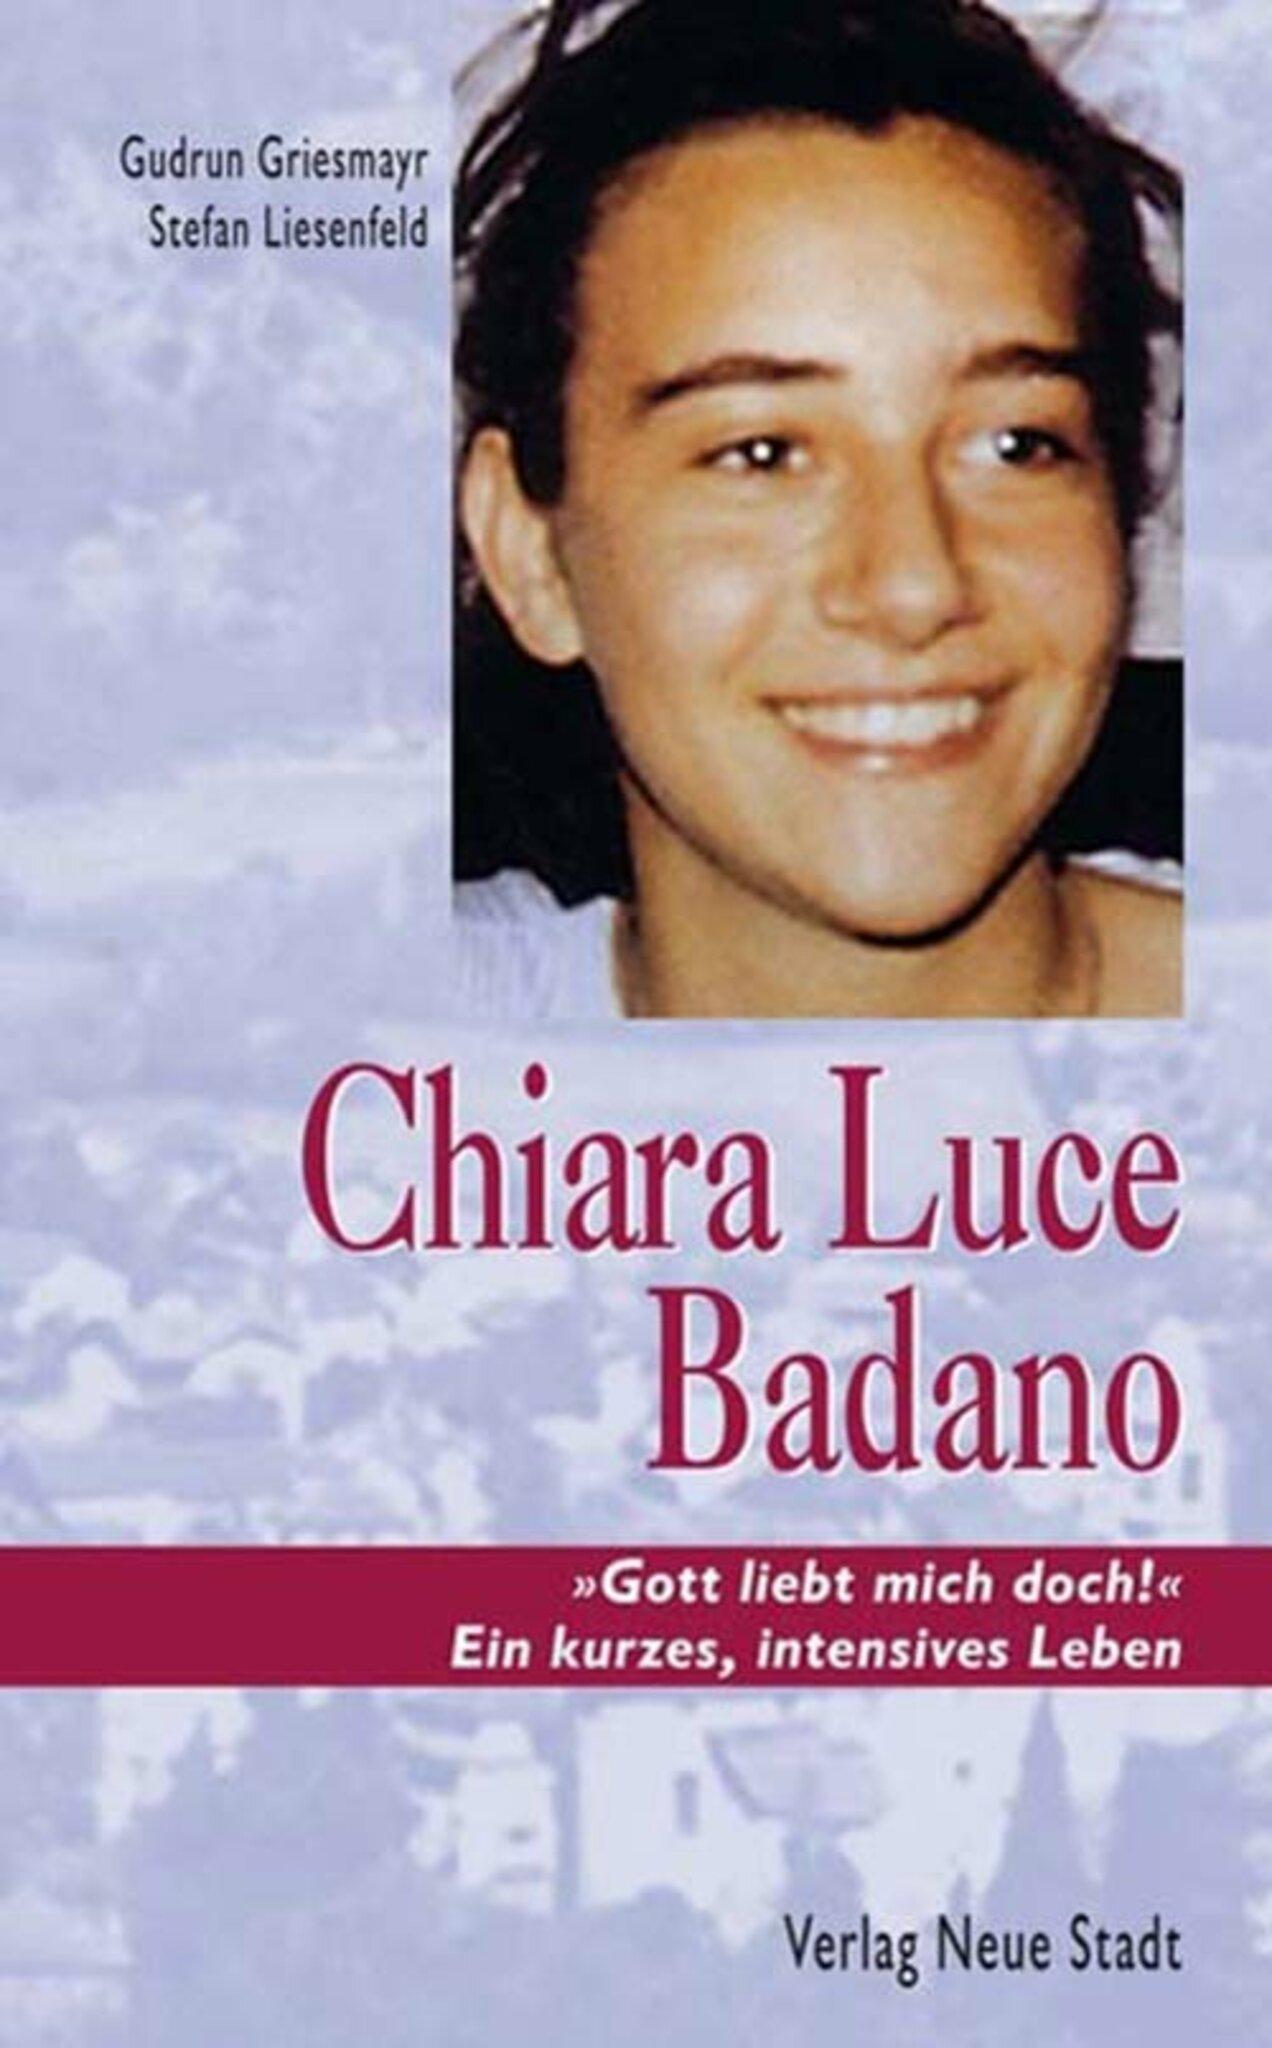 Chiara Luce Badano: